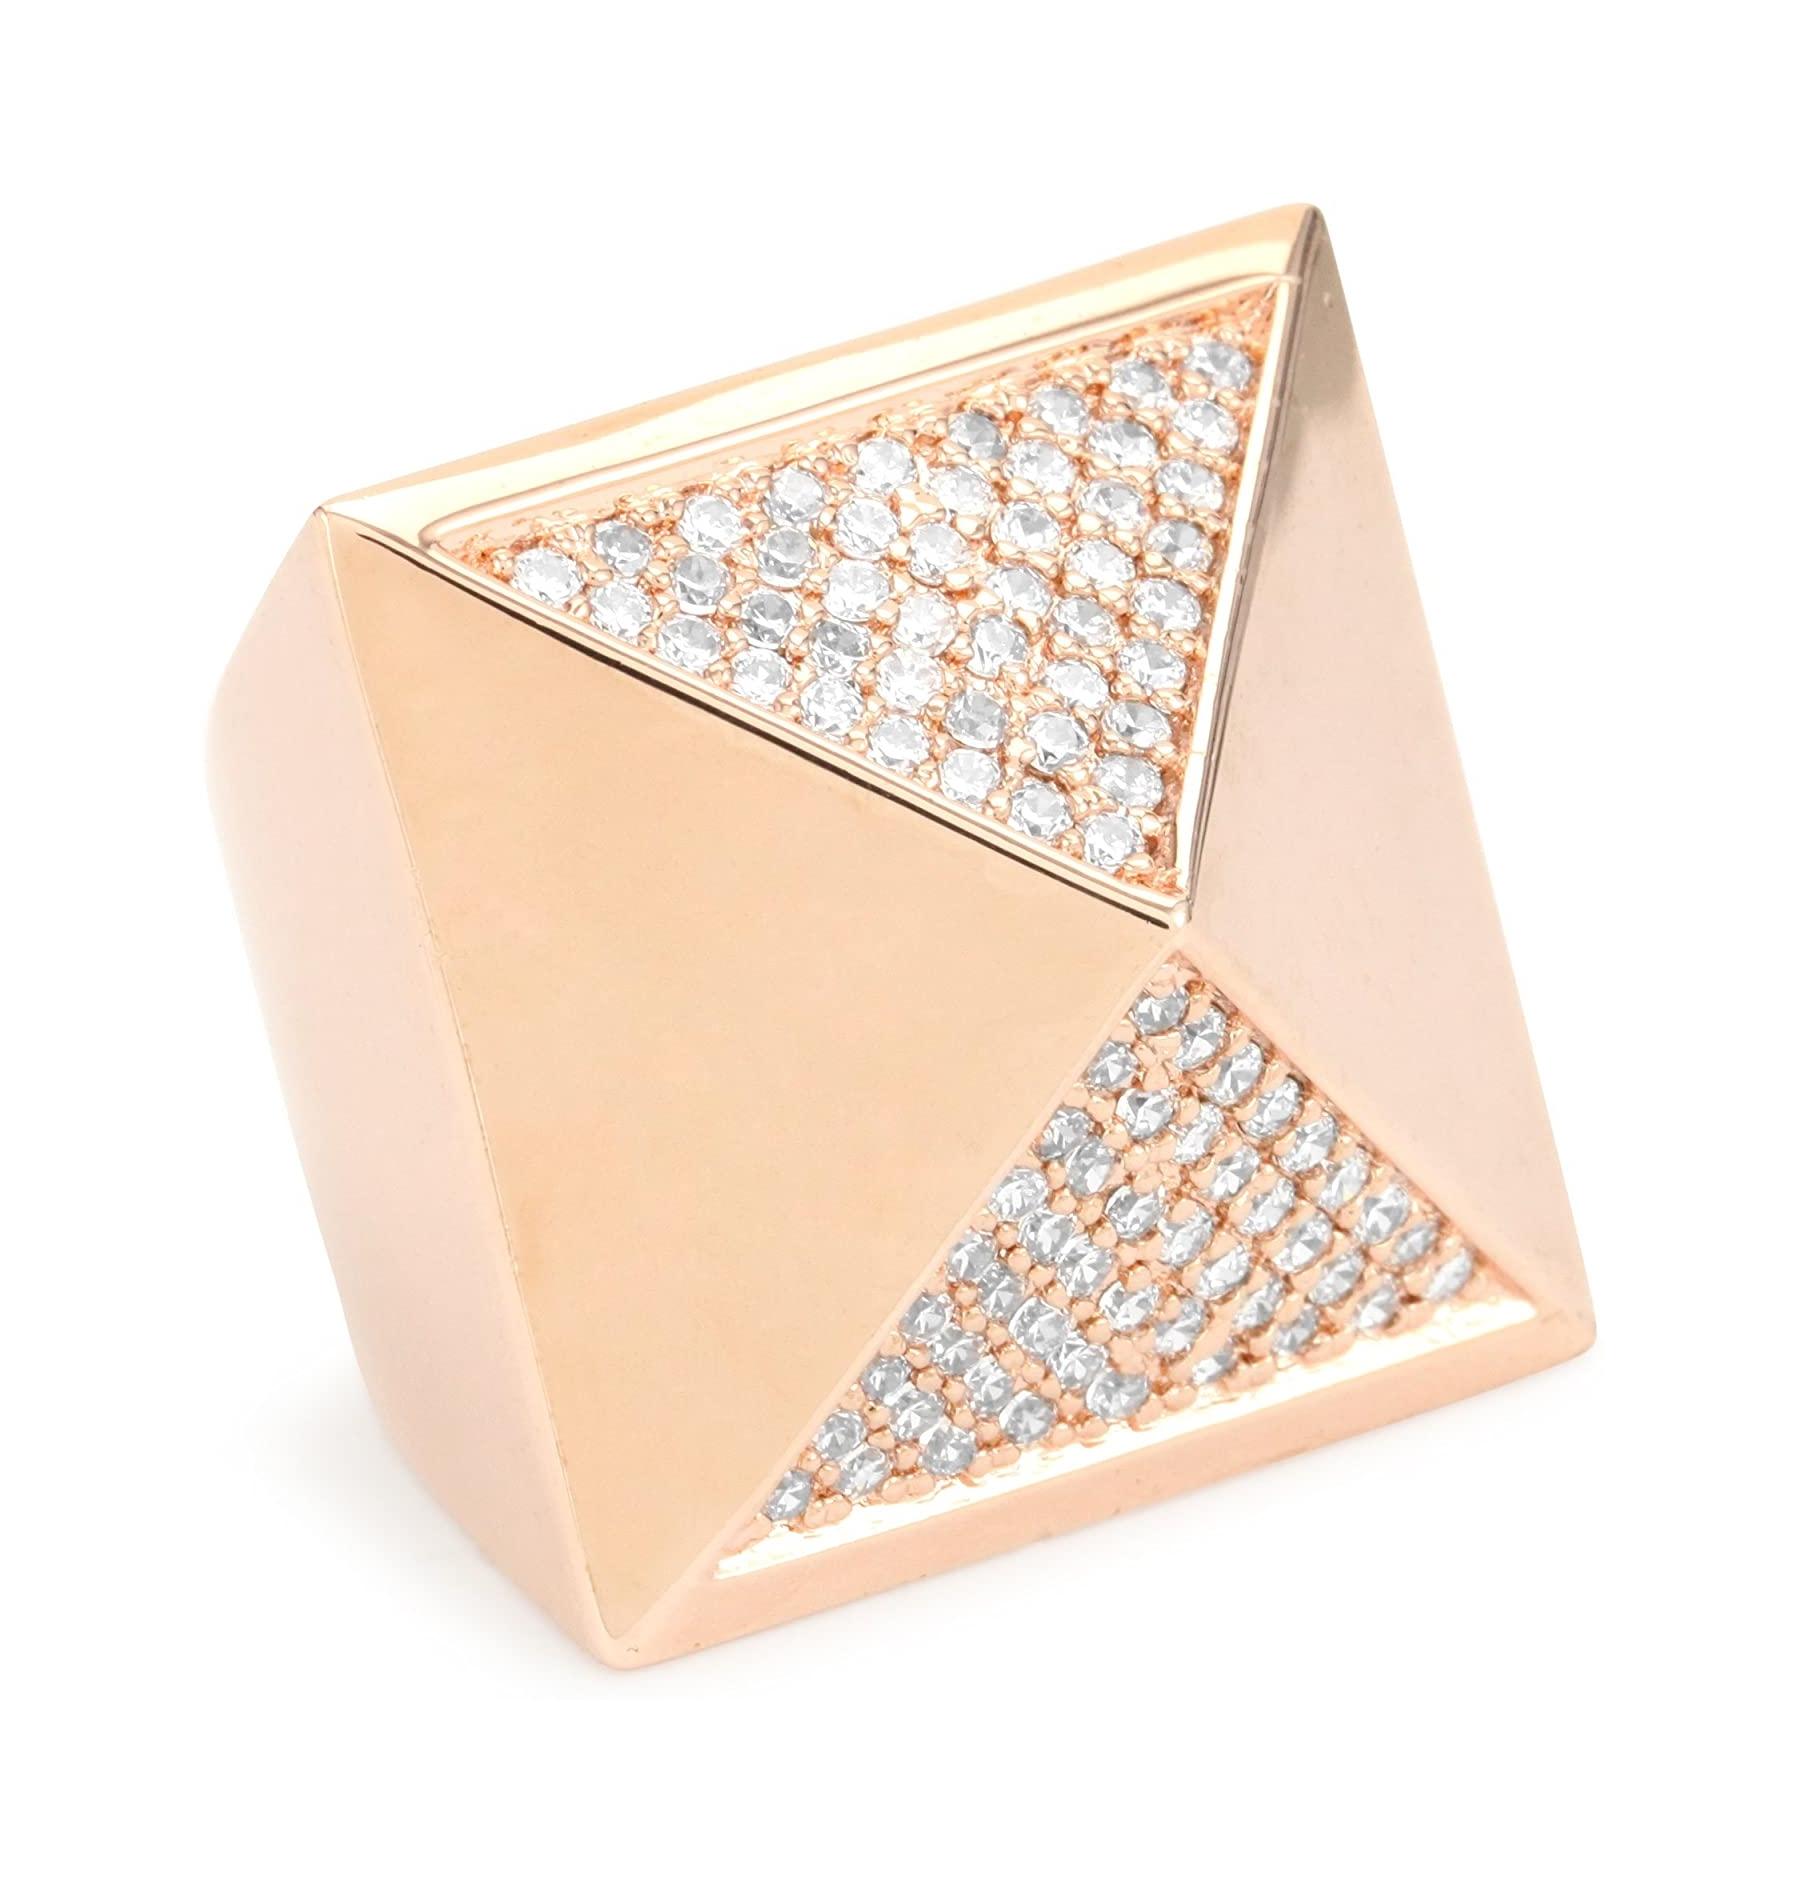 File:Noir - Sided pyramid ring.jpg